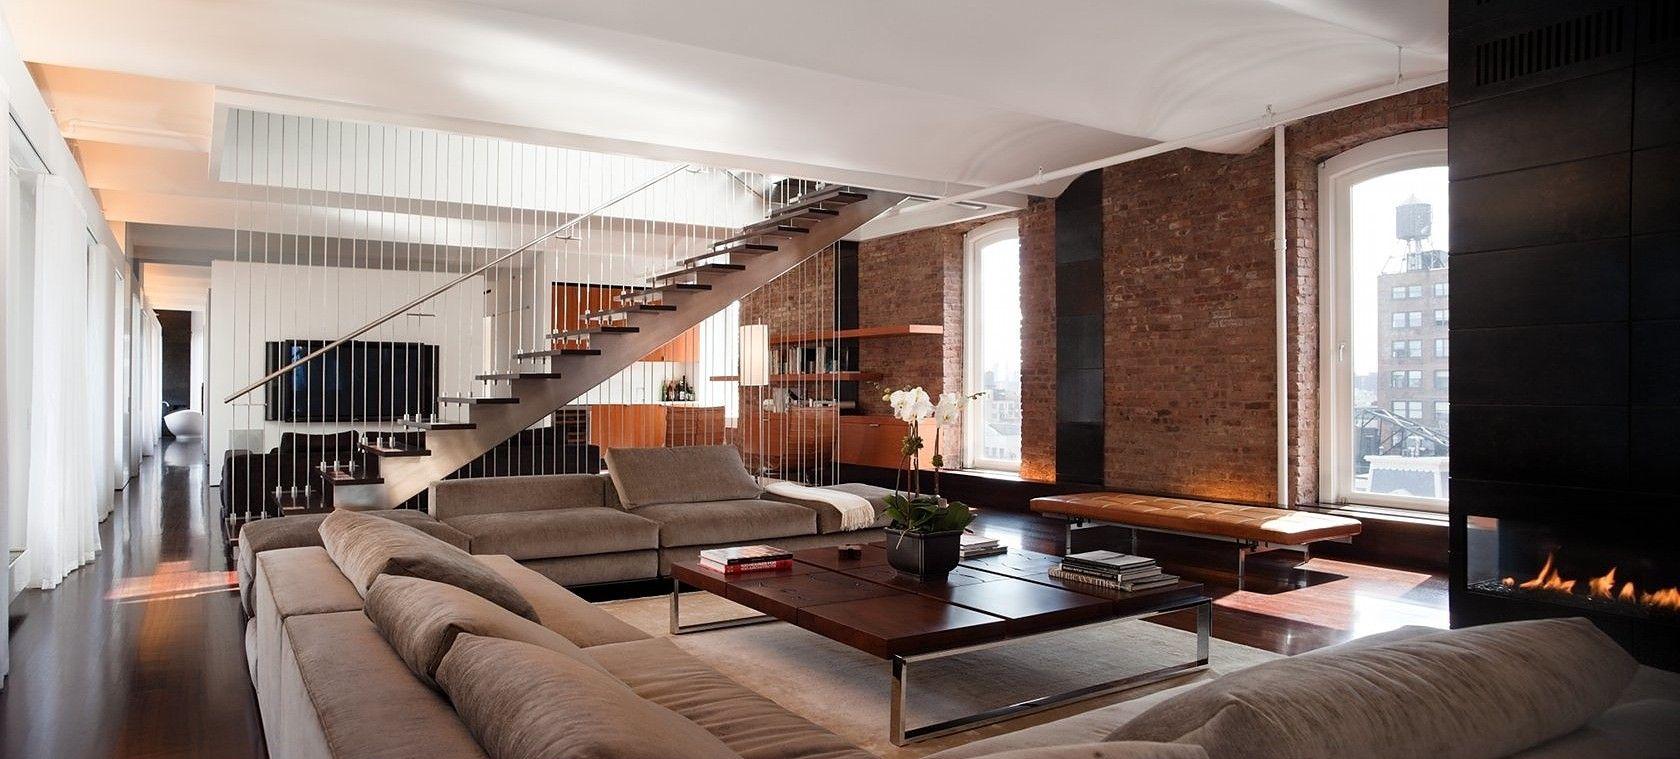 Room Stunning Loft Stunning Loft